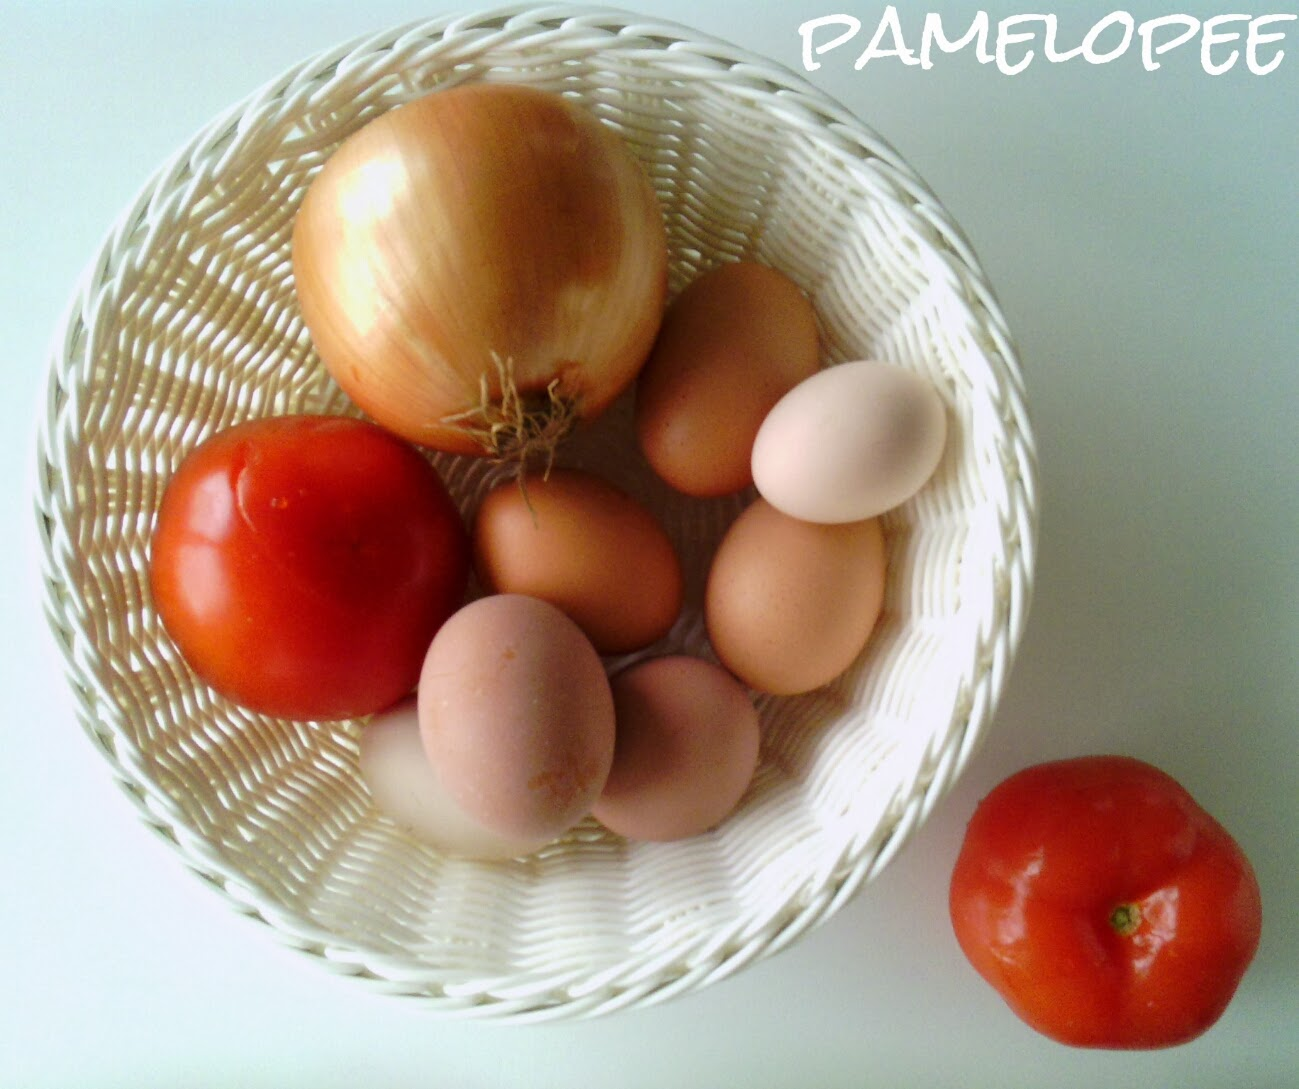 pamelopee rezept tomaten omelette. Black Bedroom Furniture Sets. Home Design Ideas